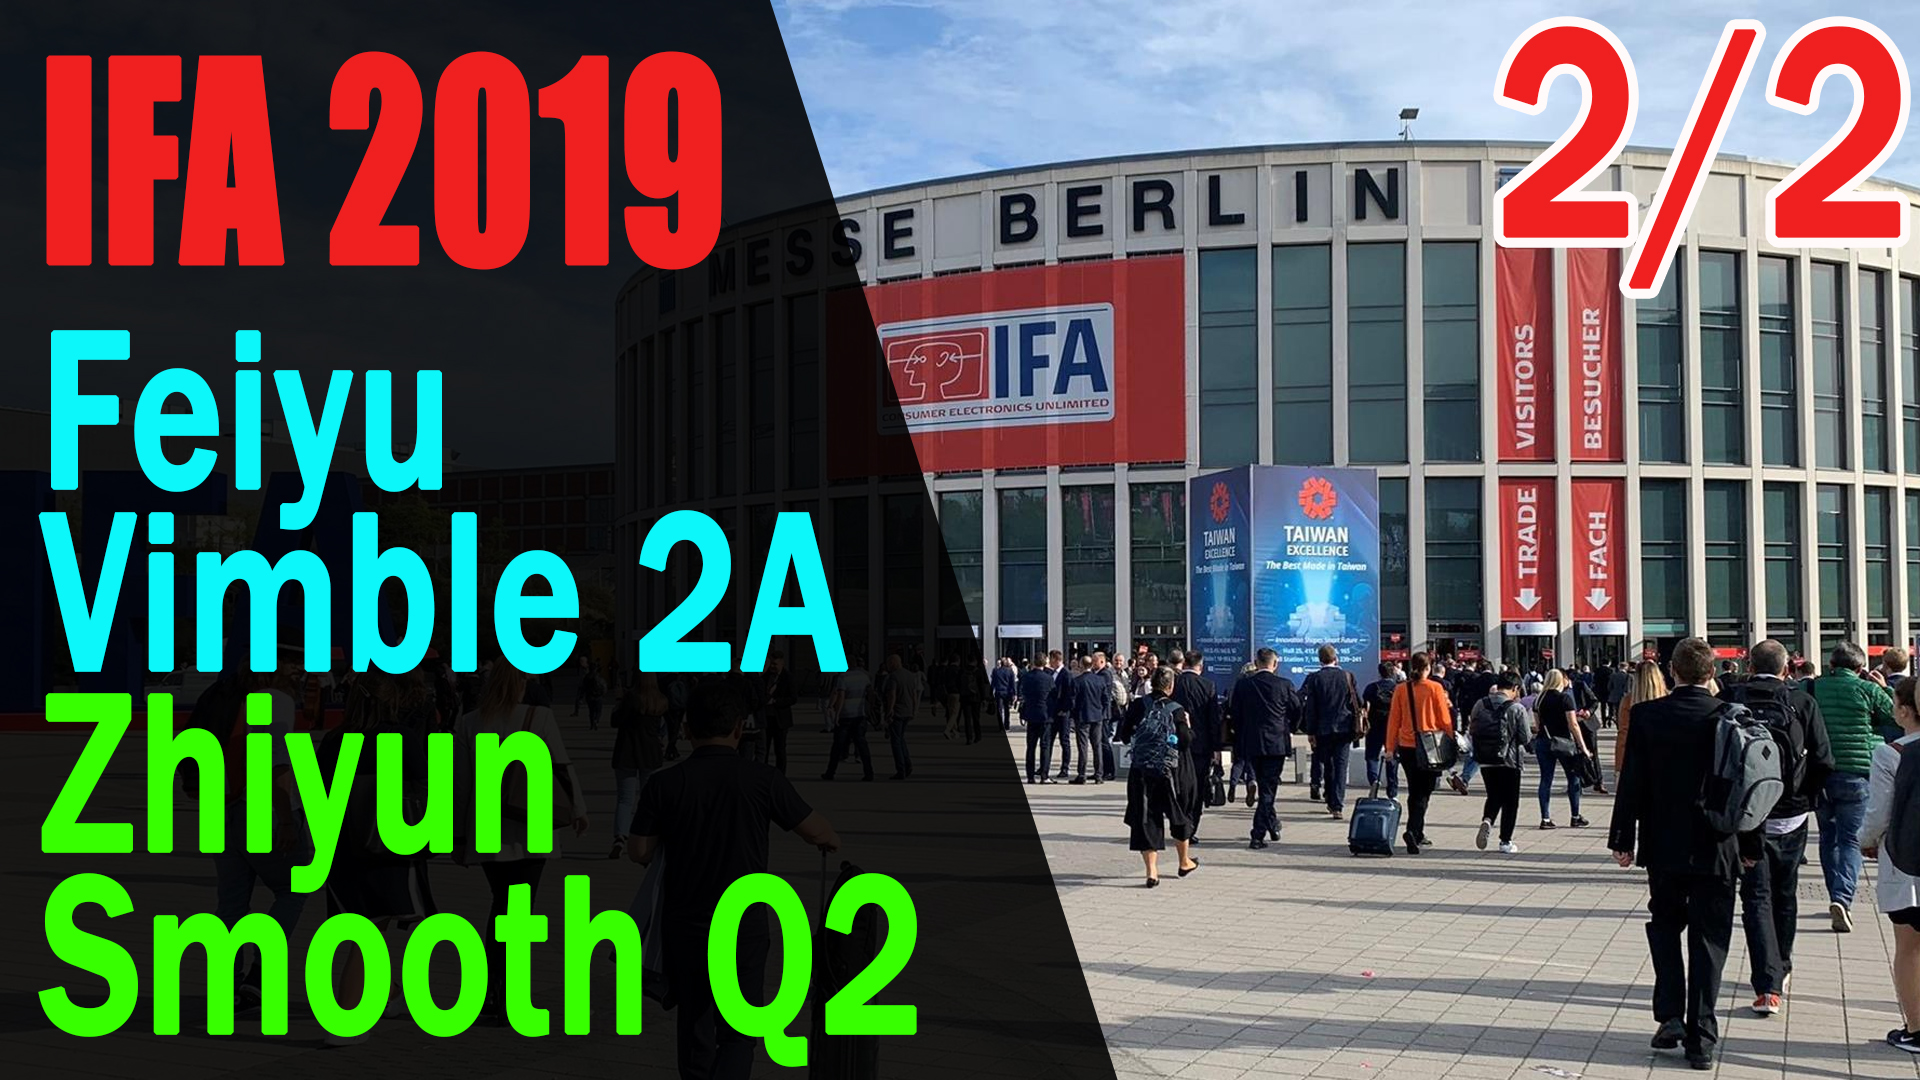 IFA 2019 (2/2) - Zhiyun Smooth Q2 a Feiyu Vimble 2A